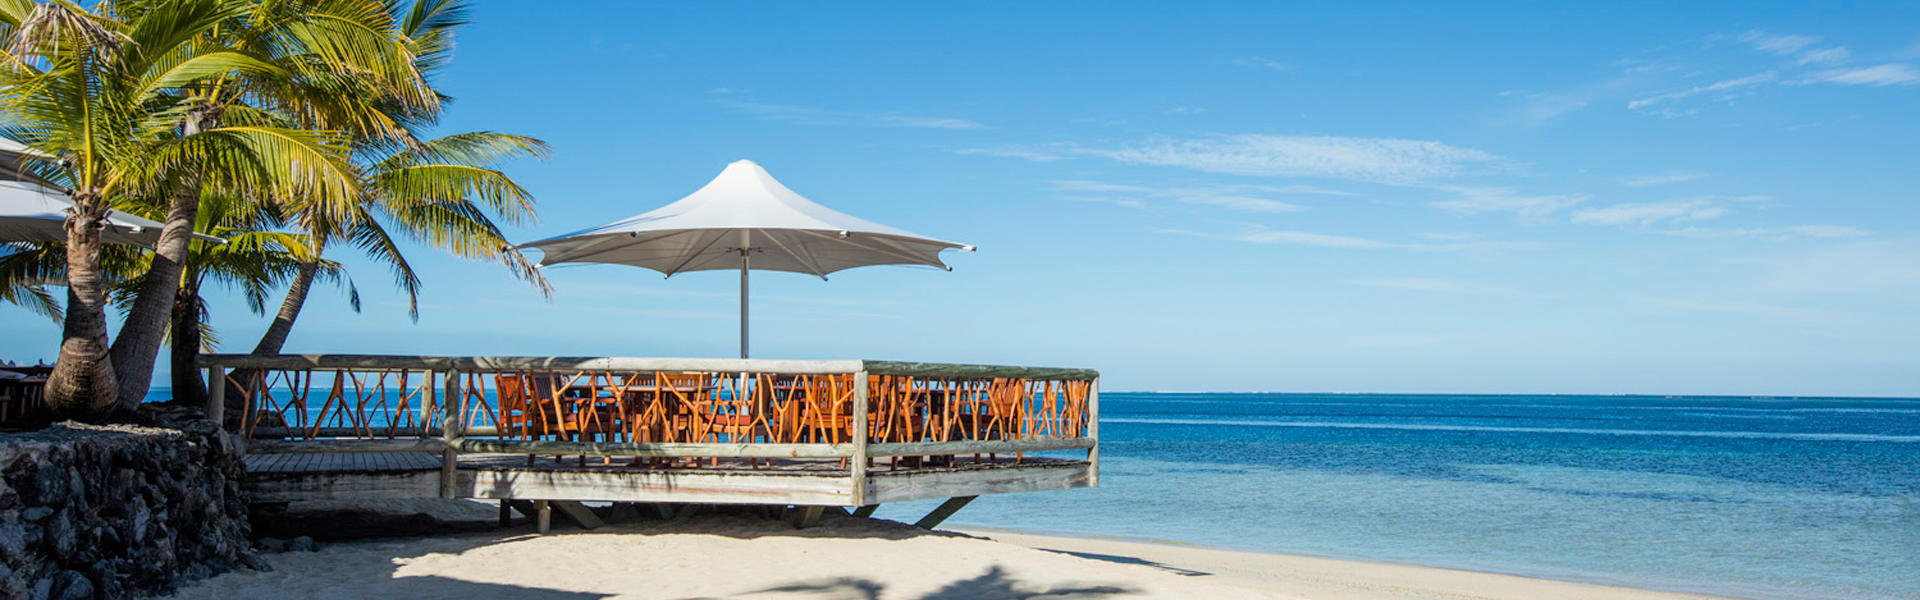 fiji travel agents in new zealand